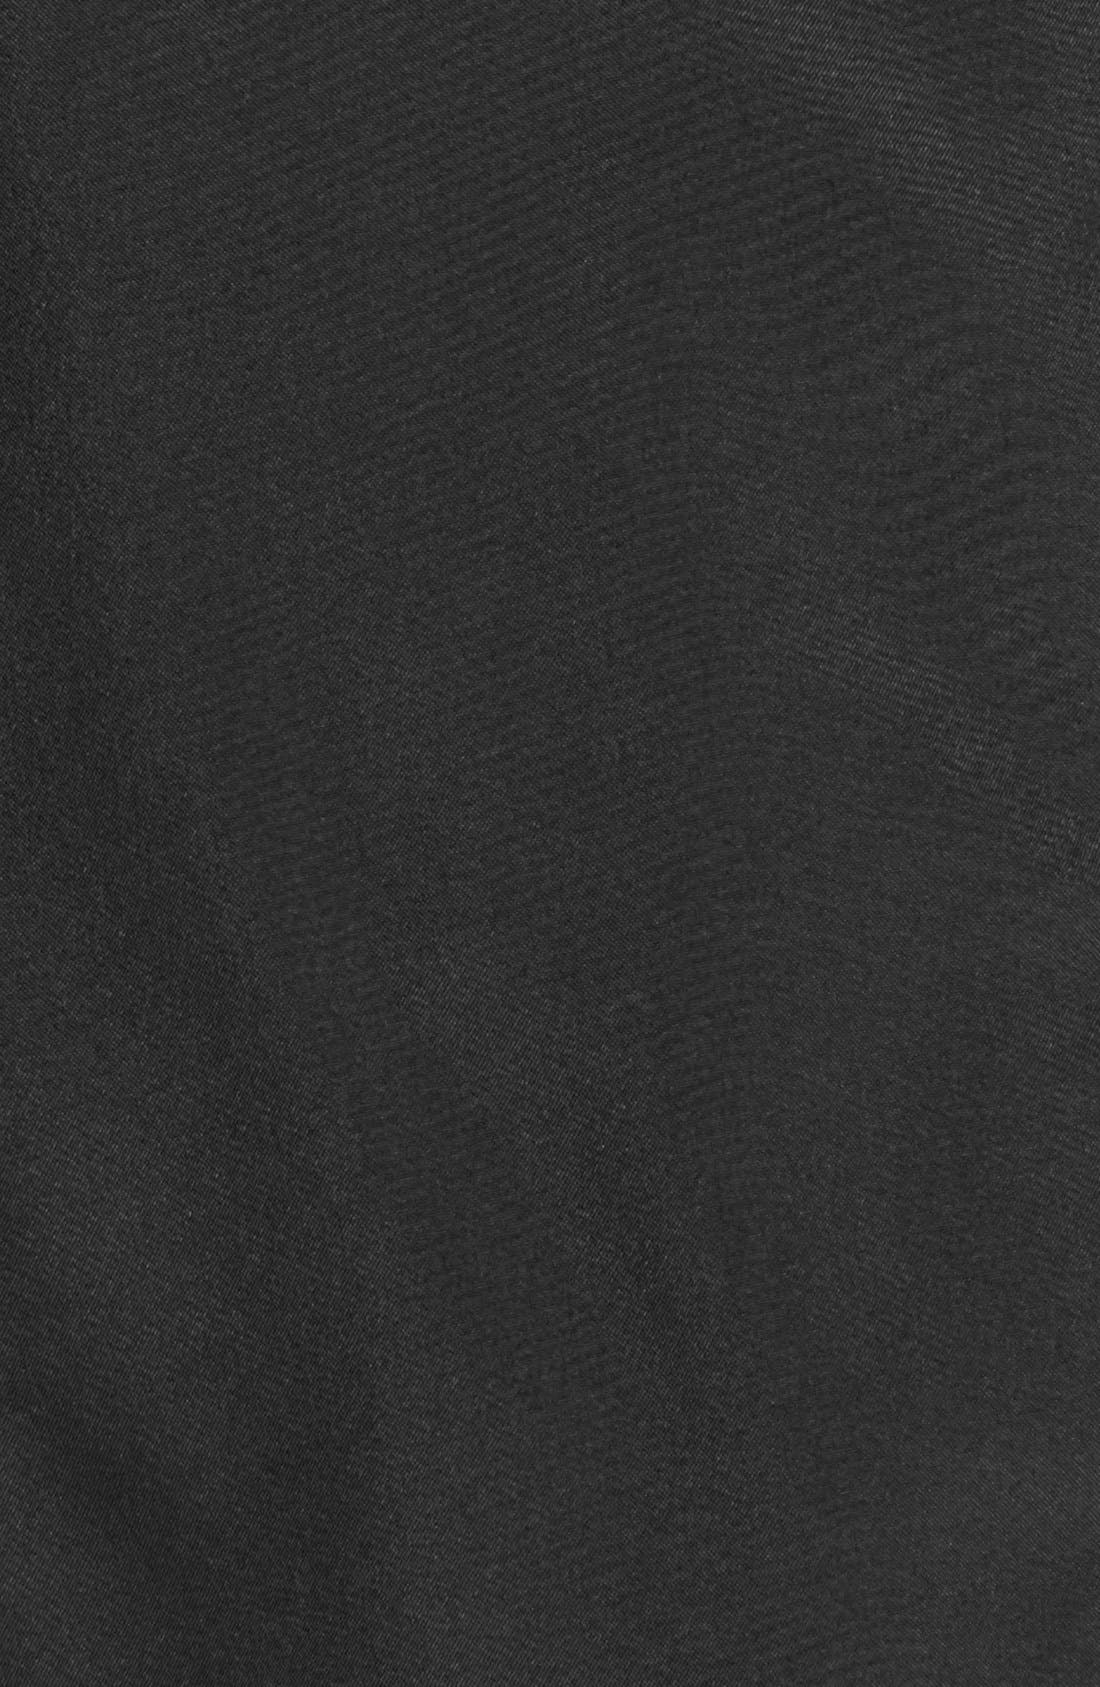 NIKE,                             'Crew' Dri-FIT Running Shorts,                             Alternate thumbnail 5, color,                             001